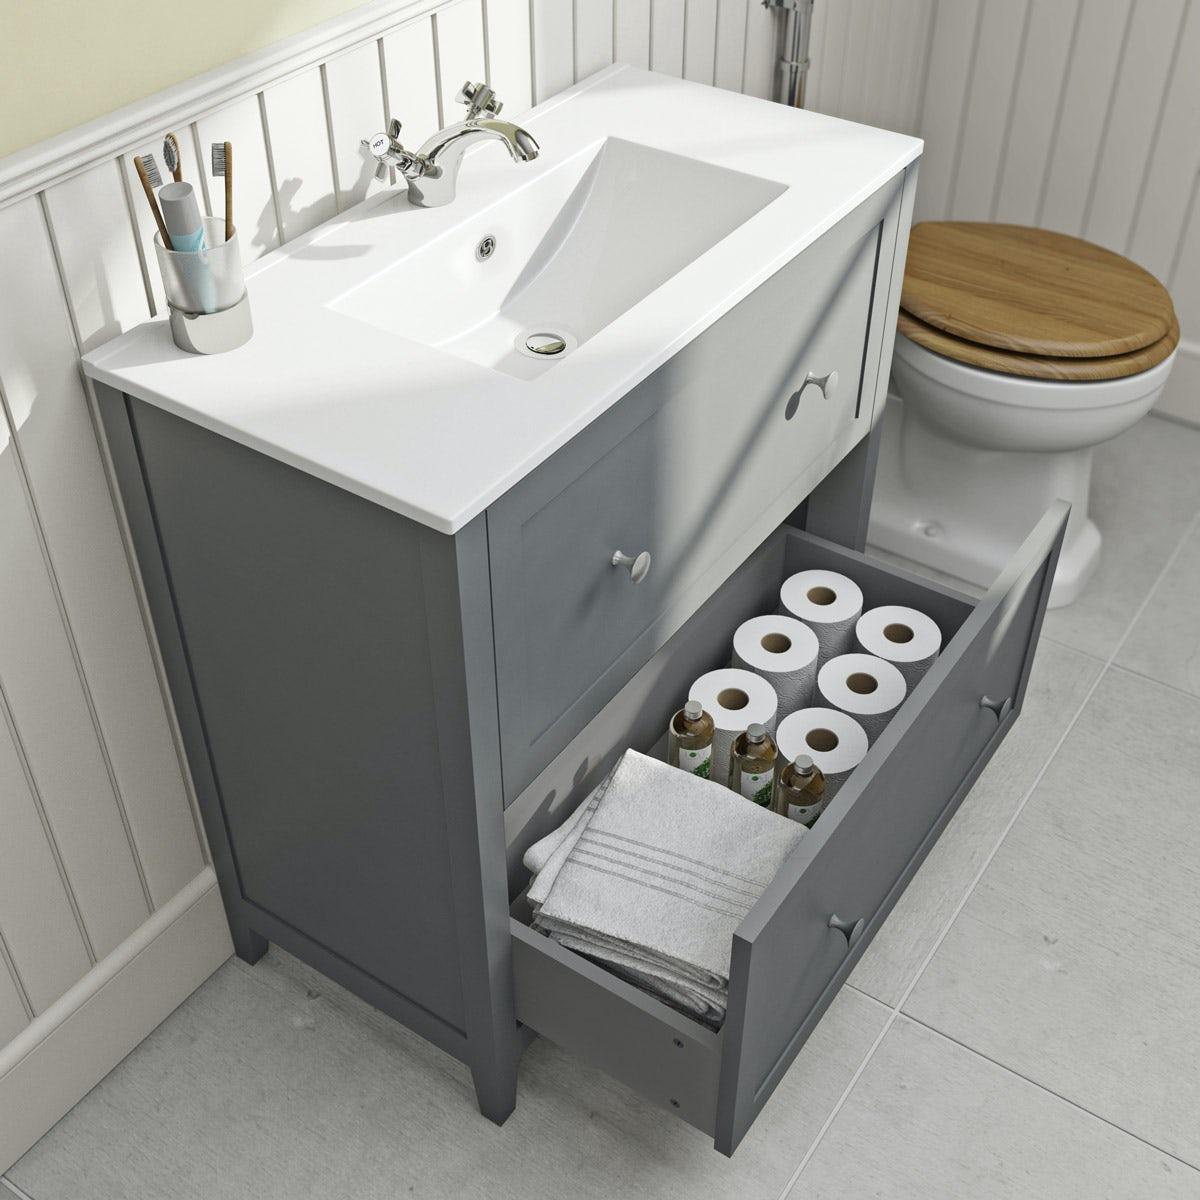 Bathroom basin vanity units